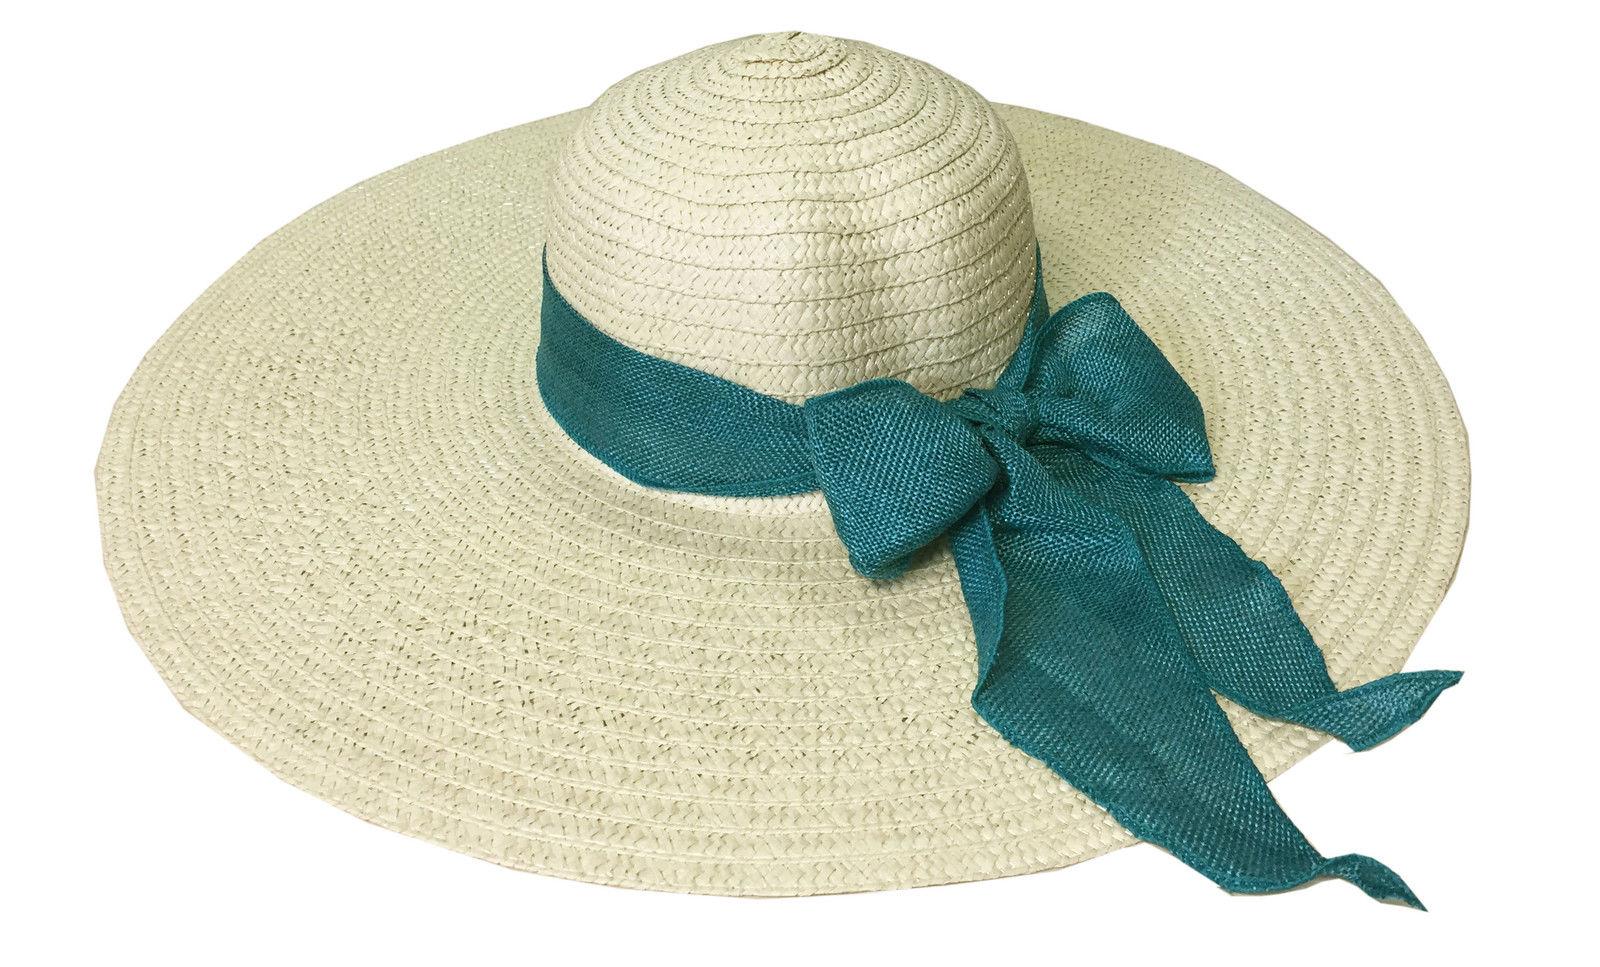 floppy beach hats - photo #18